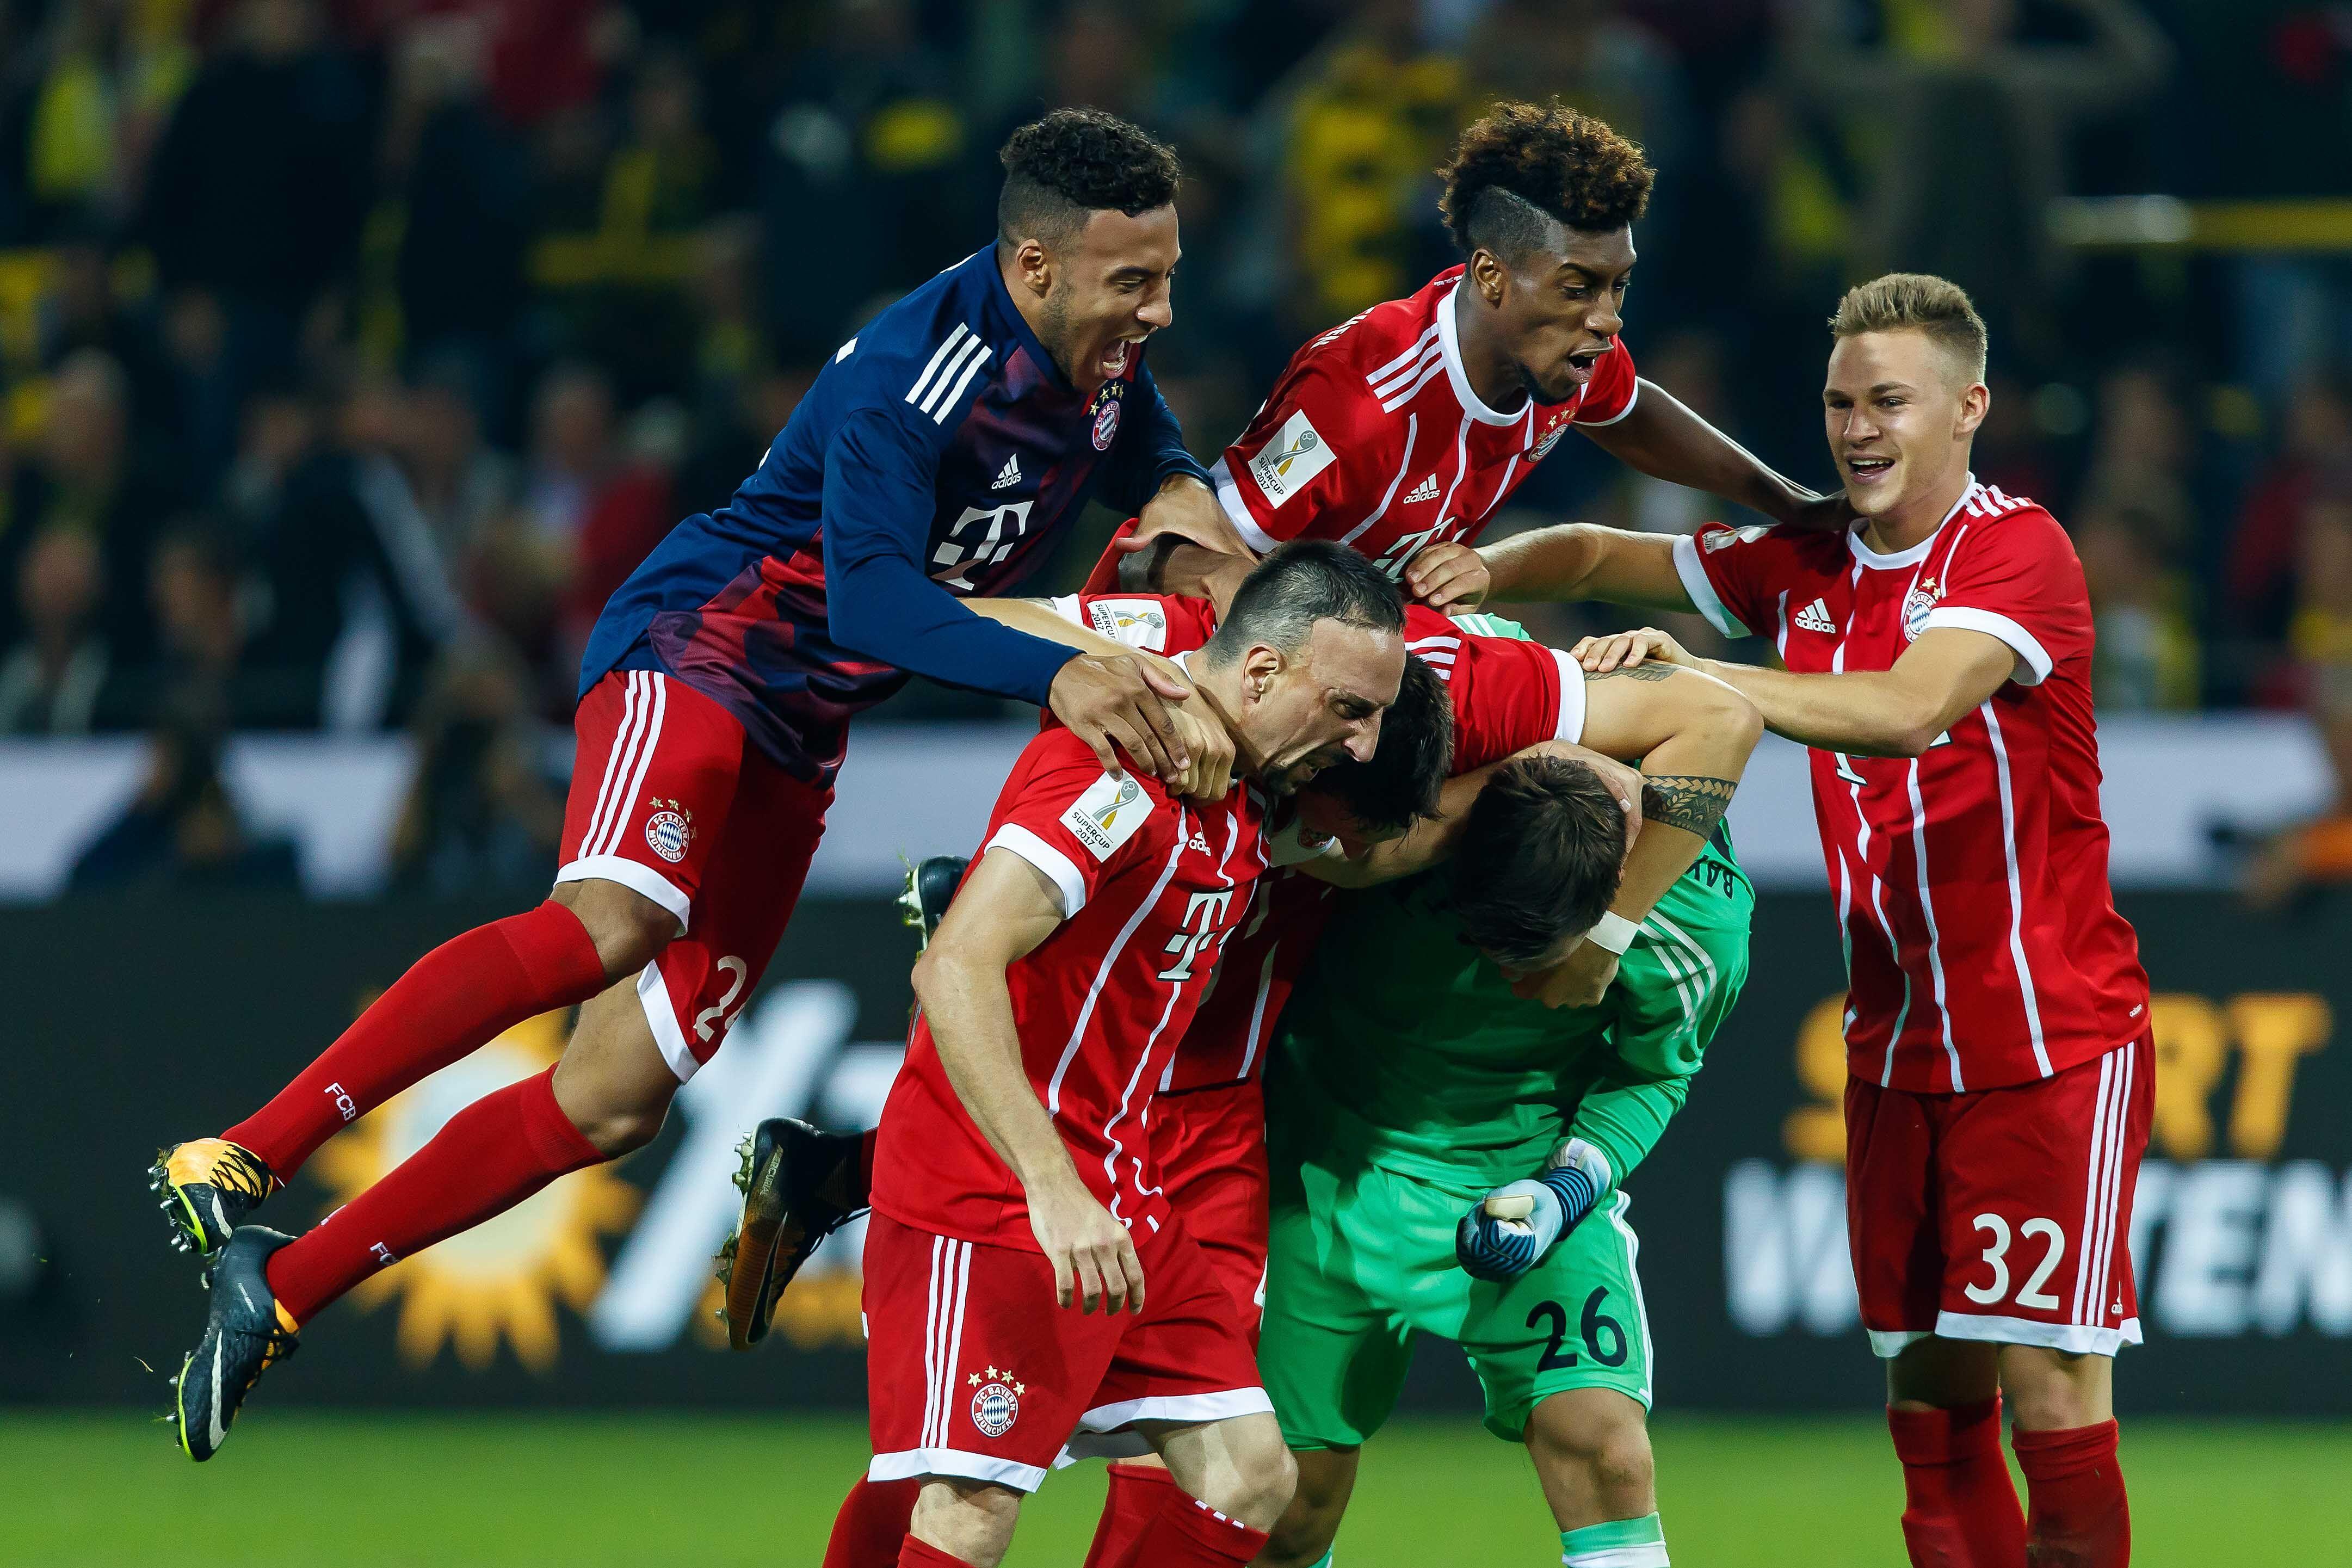 Supercup Dortmund 2017